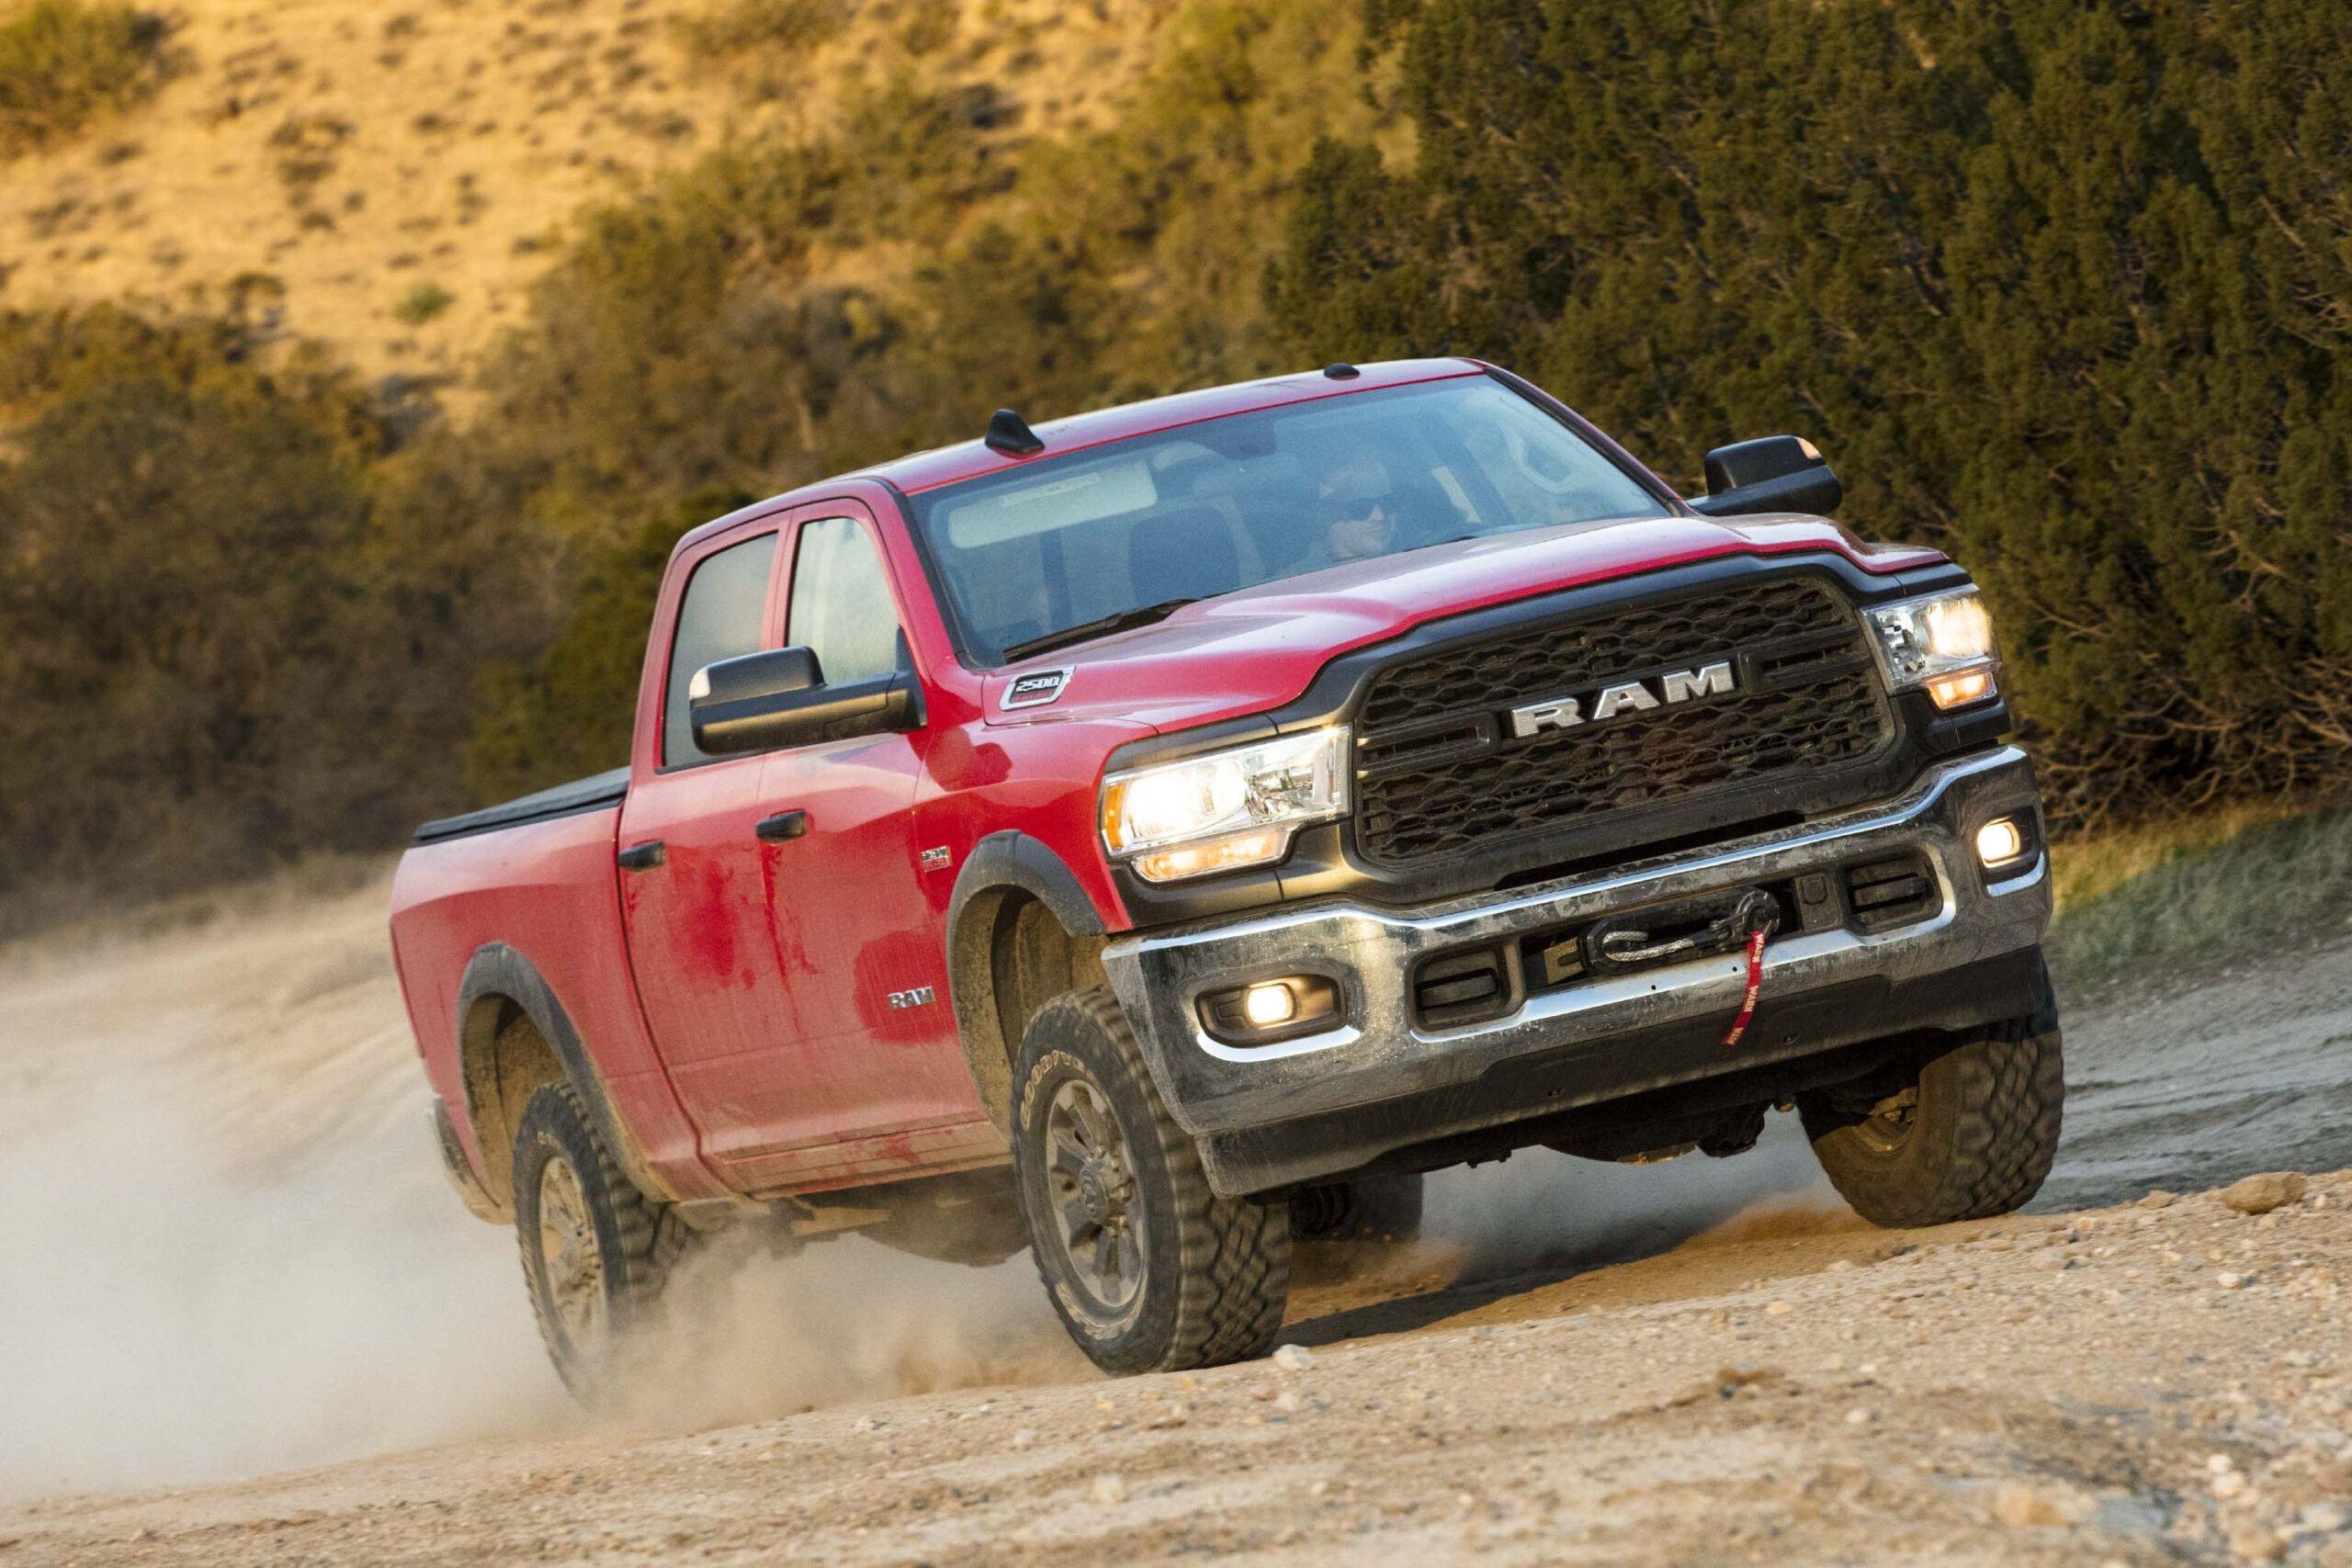 Dodge Ram 2500 Diesel 2020 Performance Check more at https